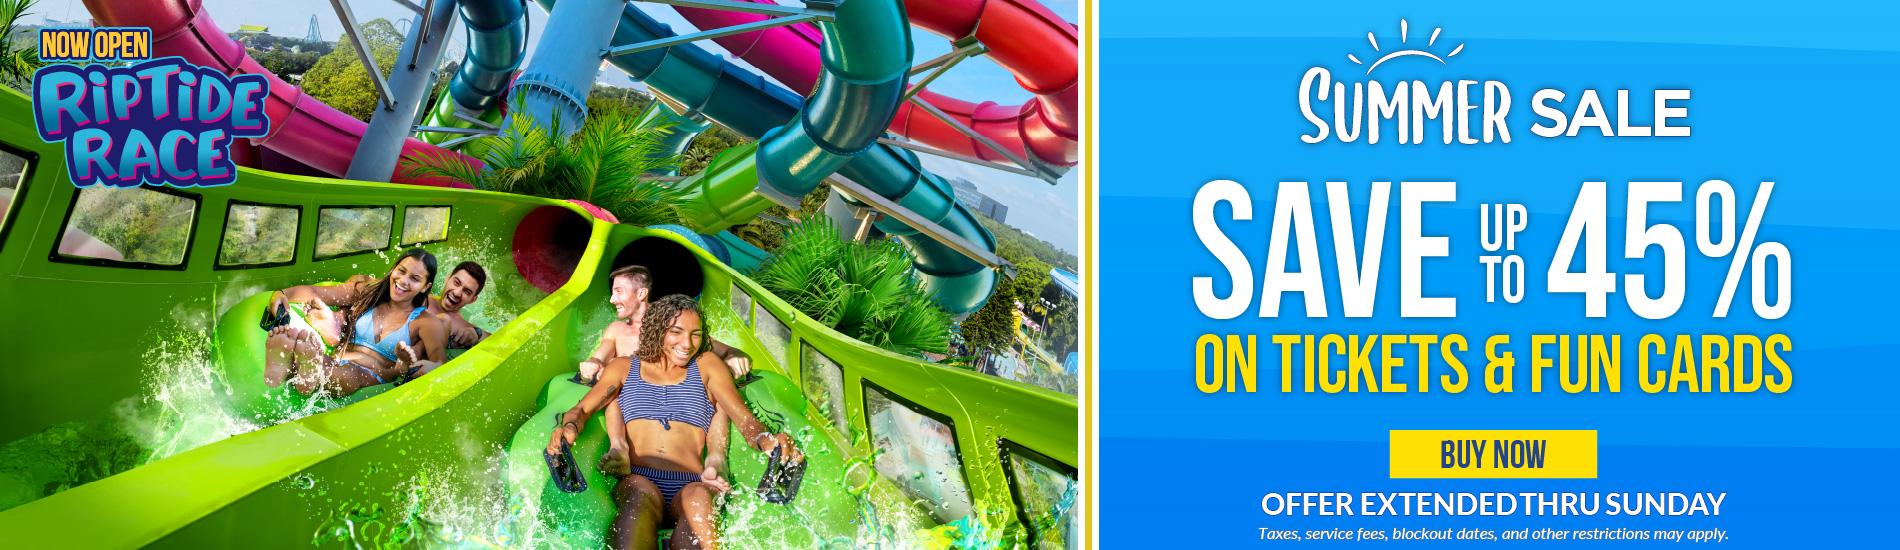 Aquatica Orlando Summer Sale